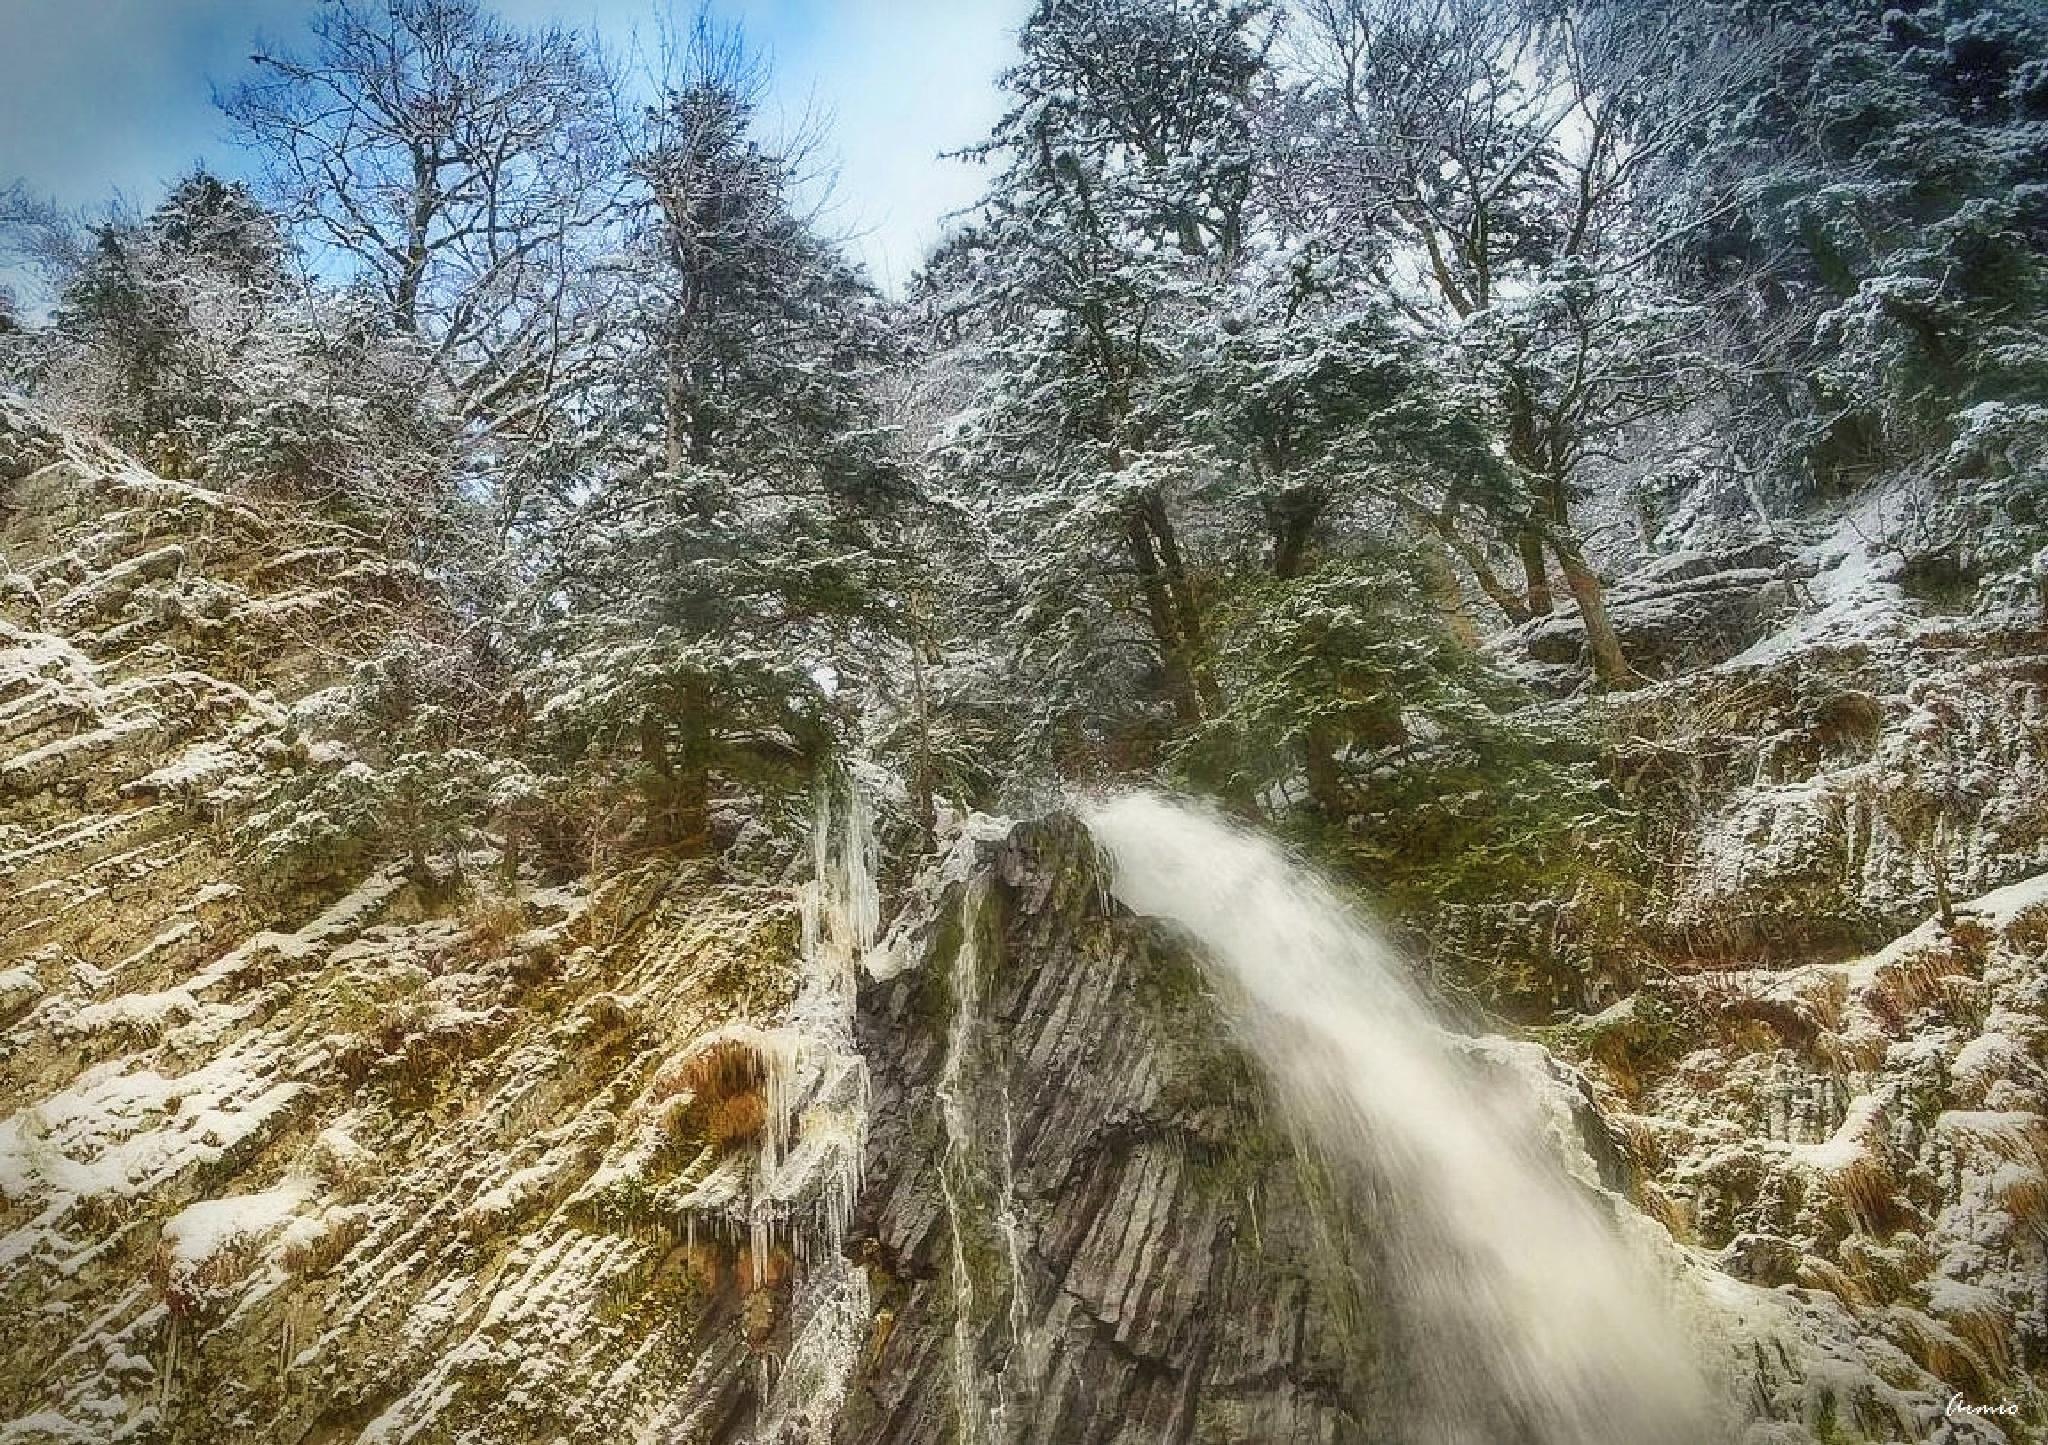 Cascade de Queureuilh Auvergne by Armio